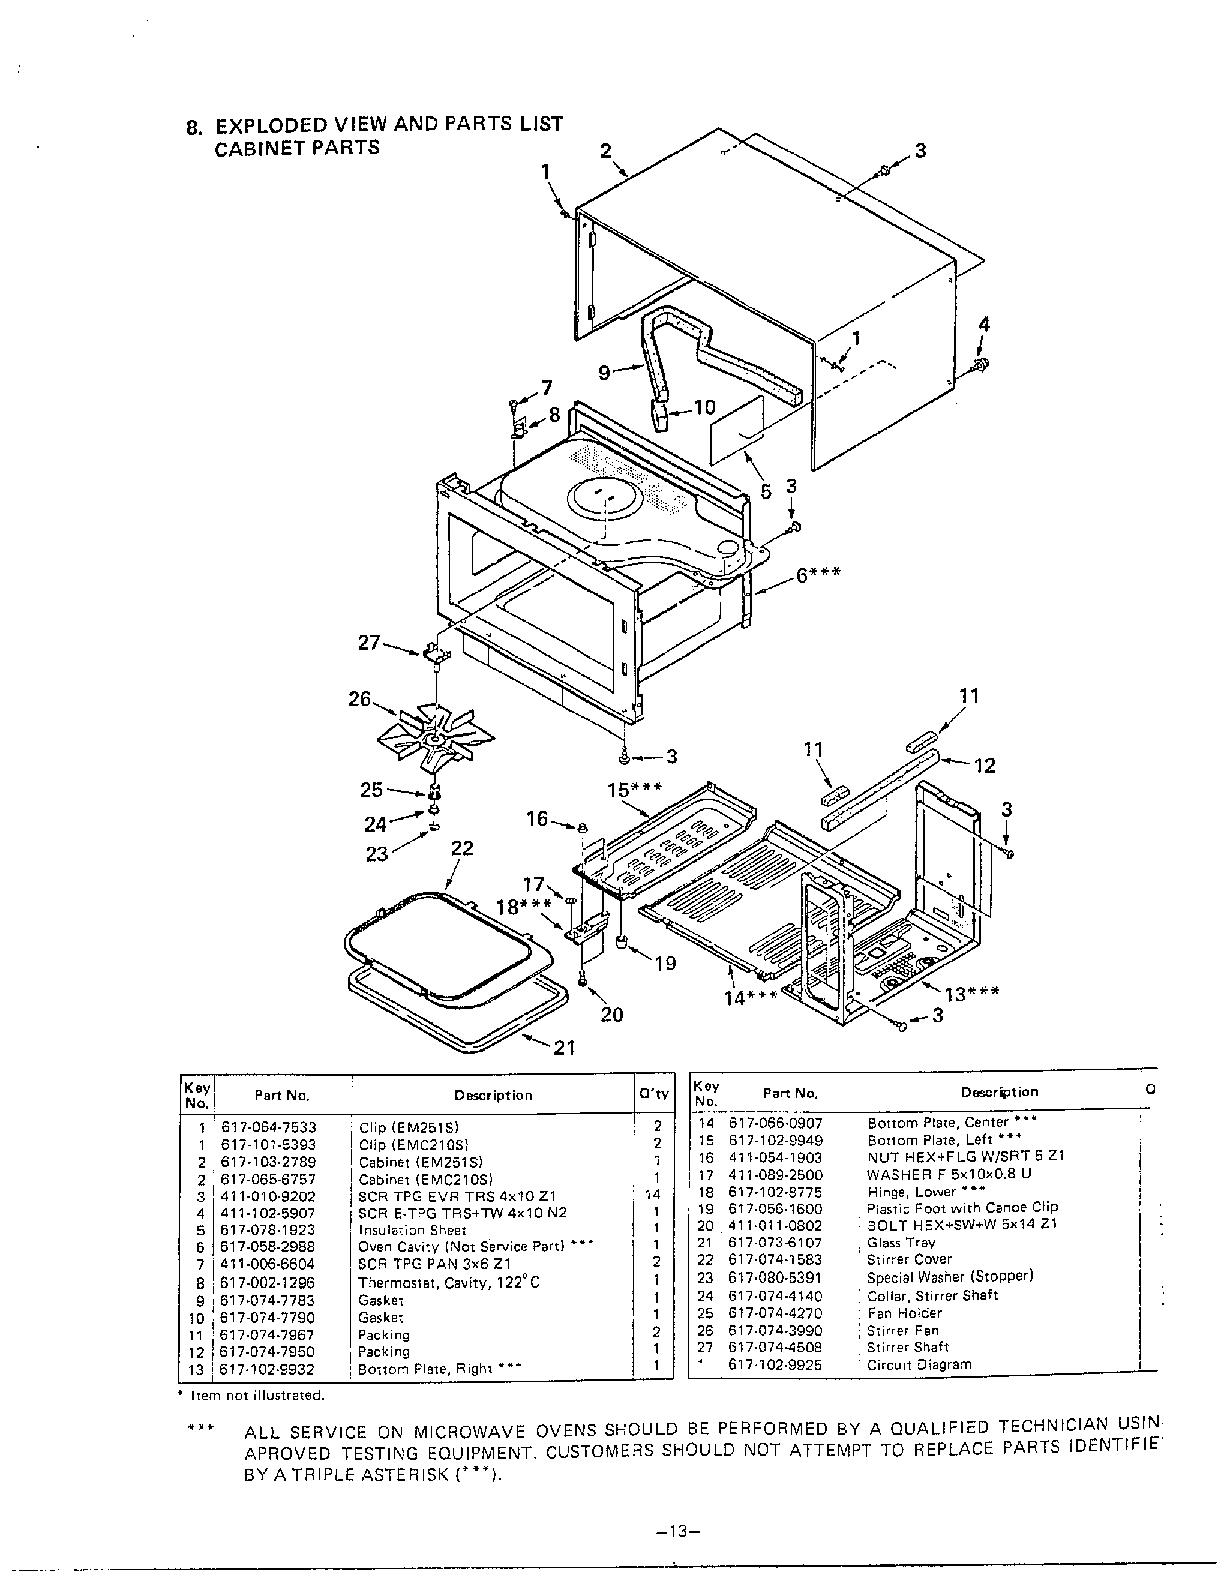 Sanyo model EMC211S countertop microwave genuine parts